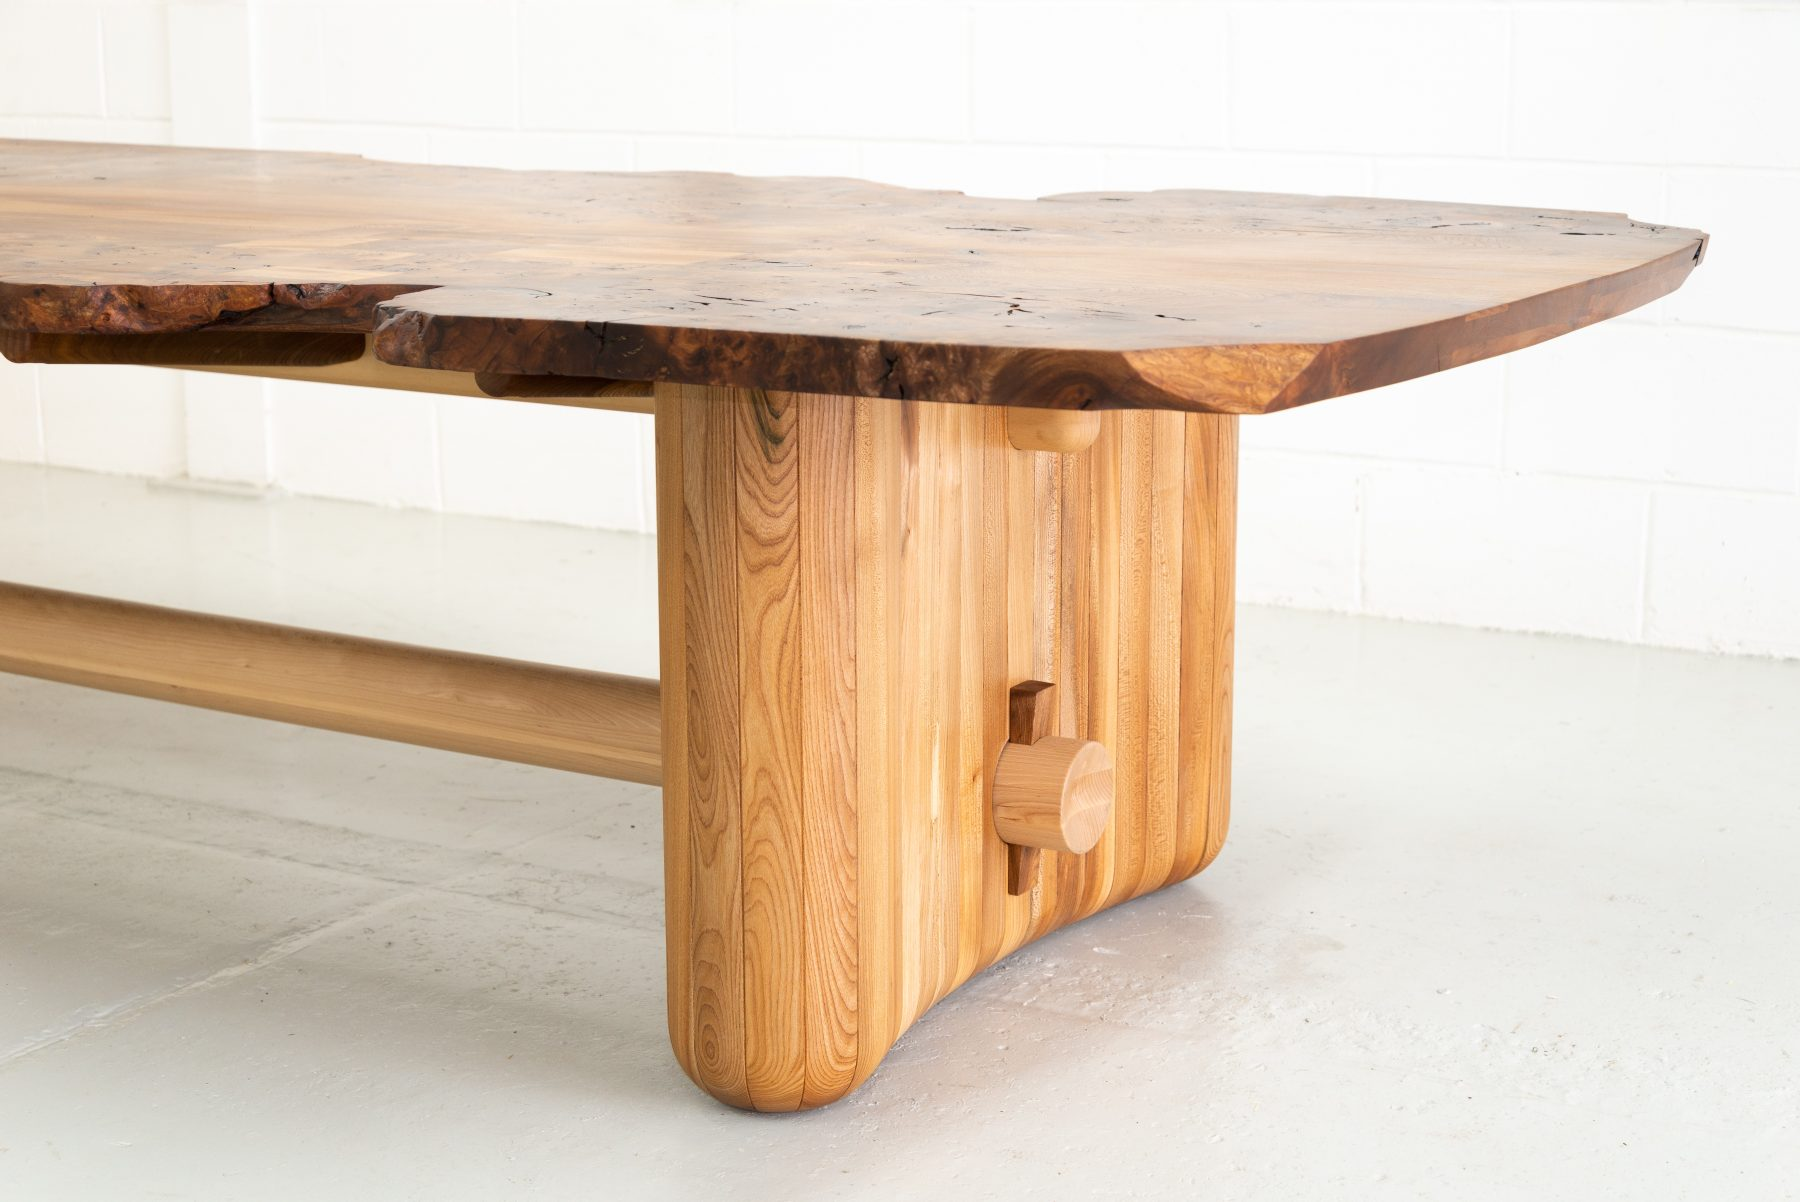 Jan Hendzel Studio Naama Table2